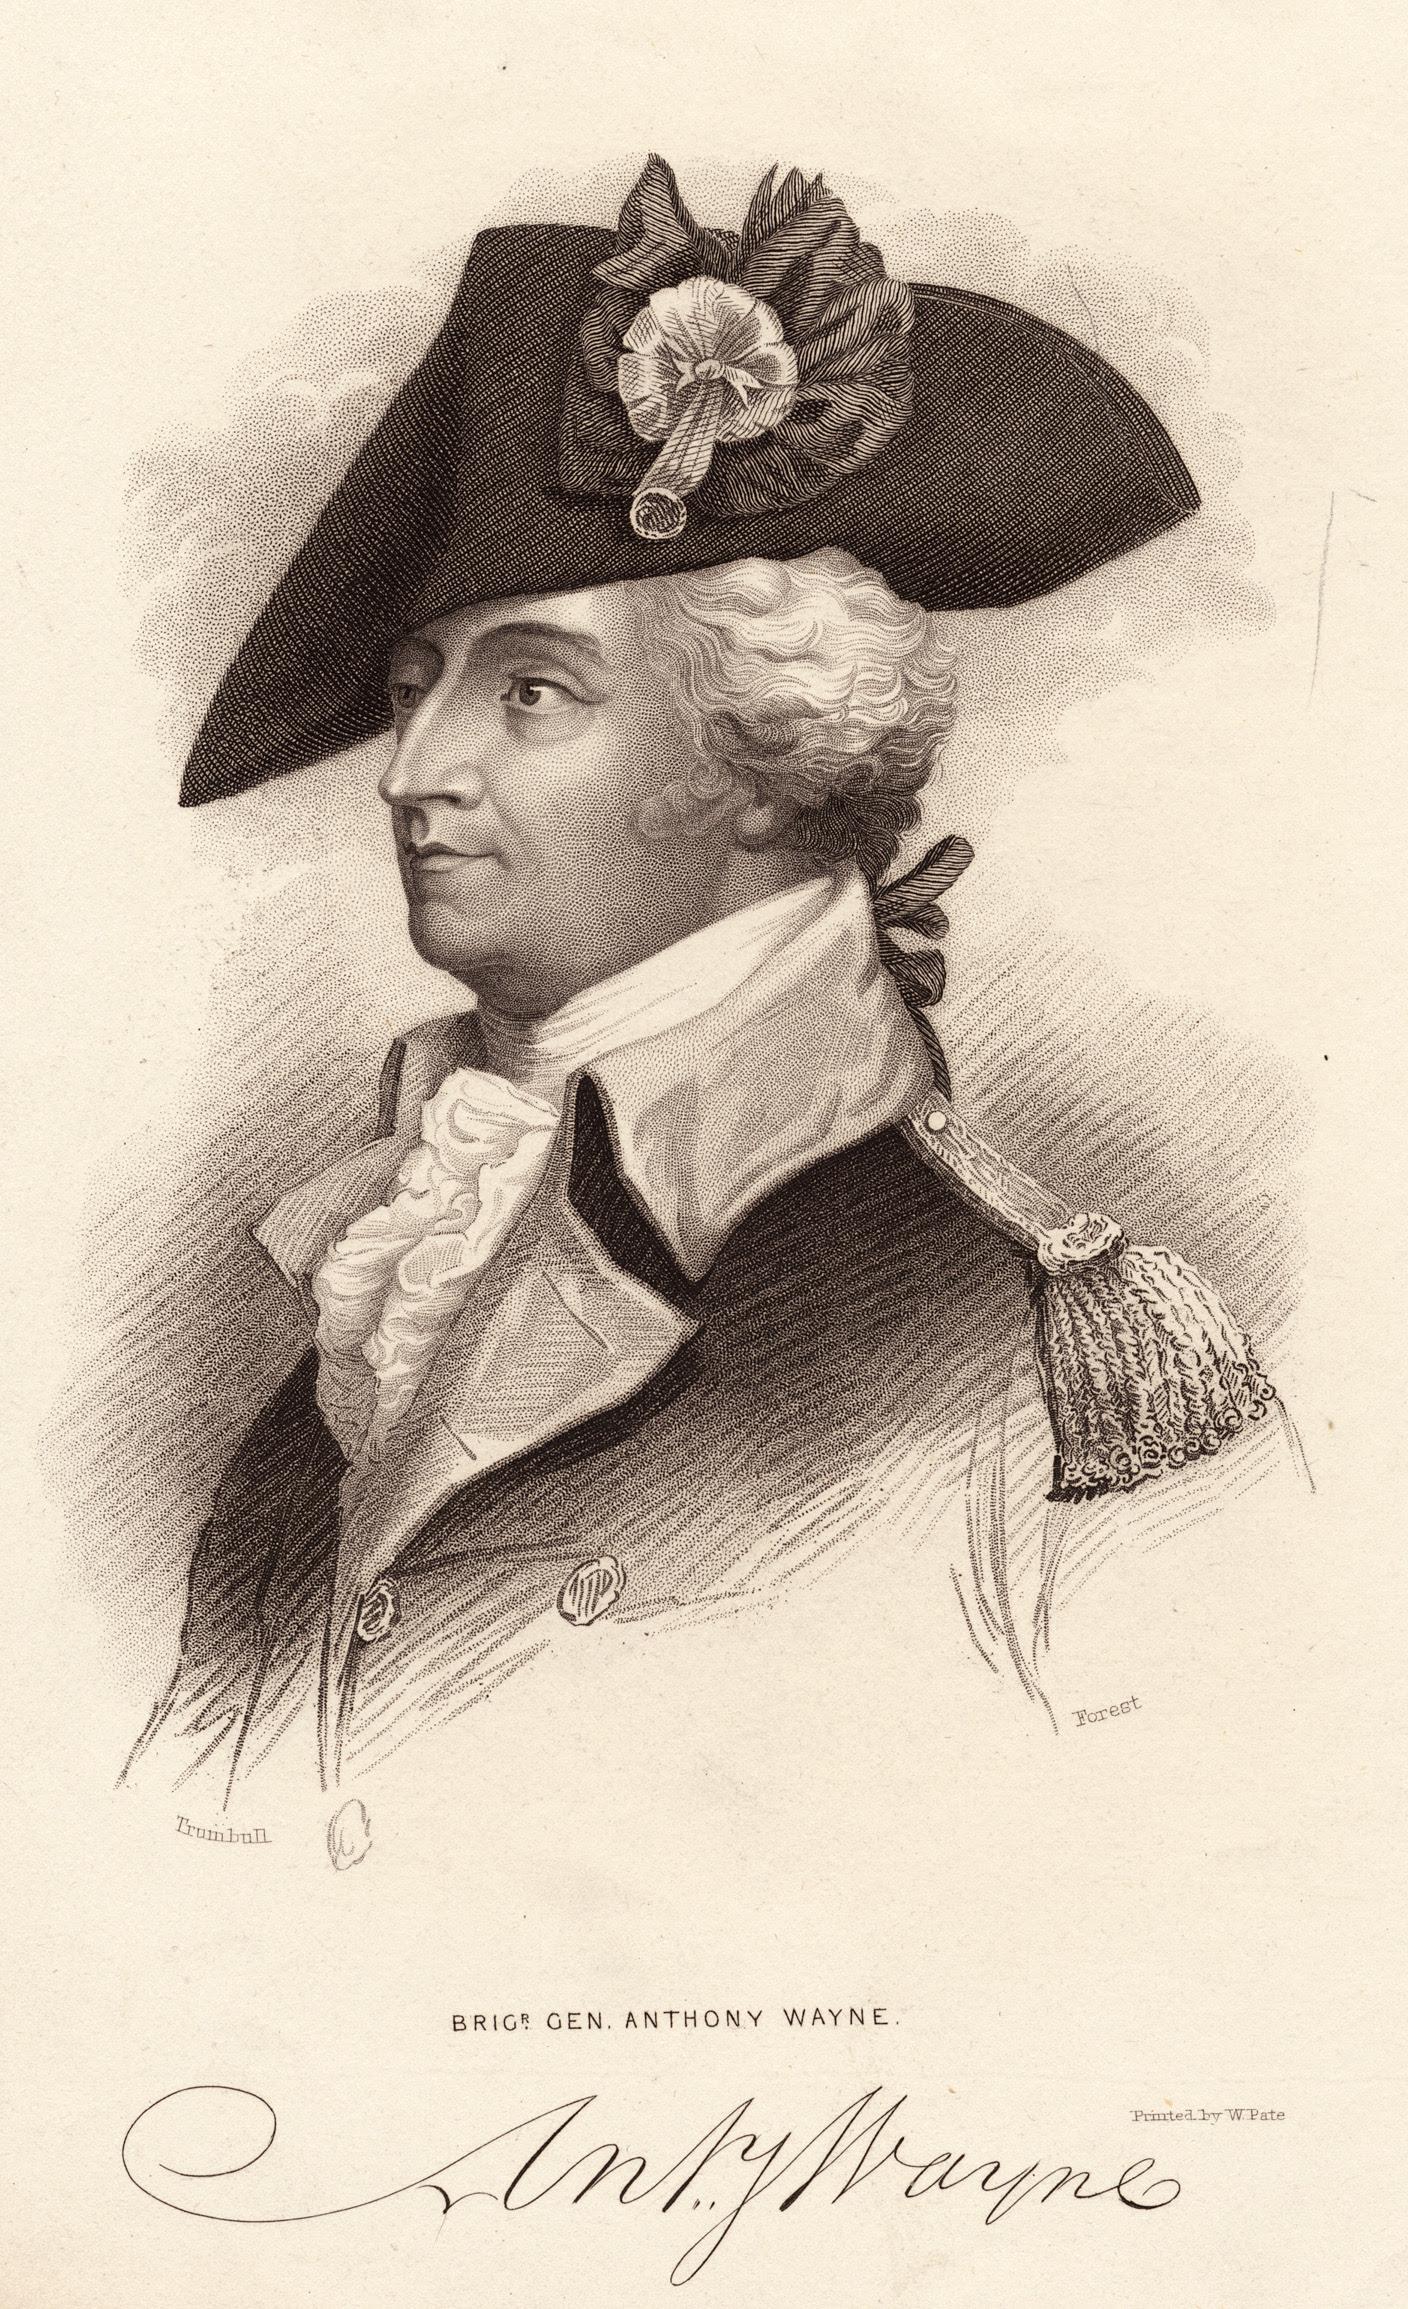 General 'Mad' Anthony Wayne